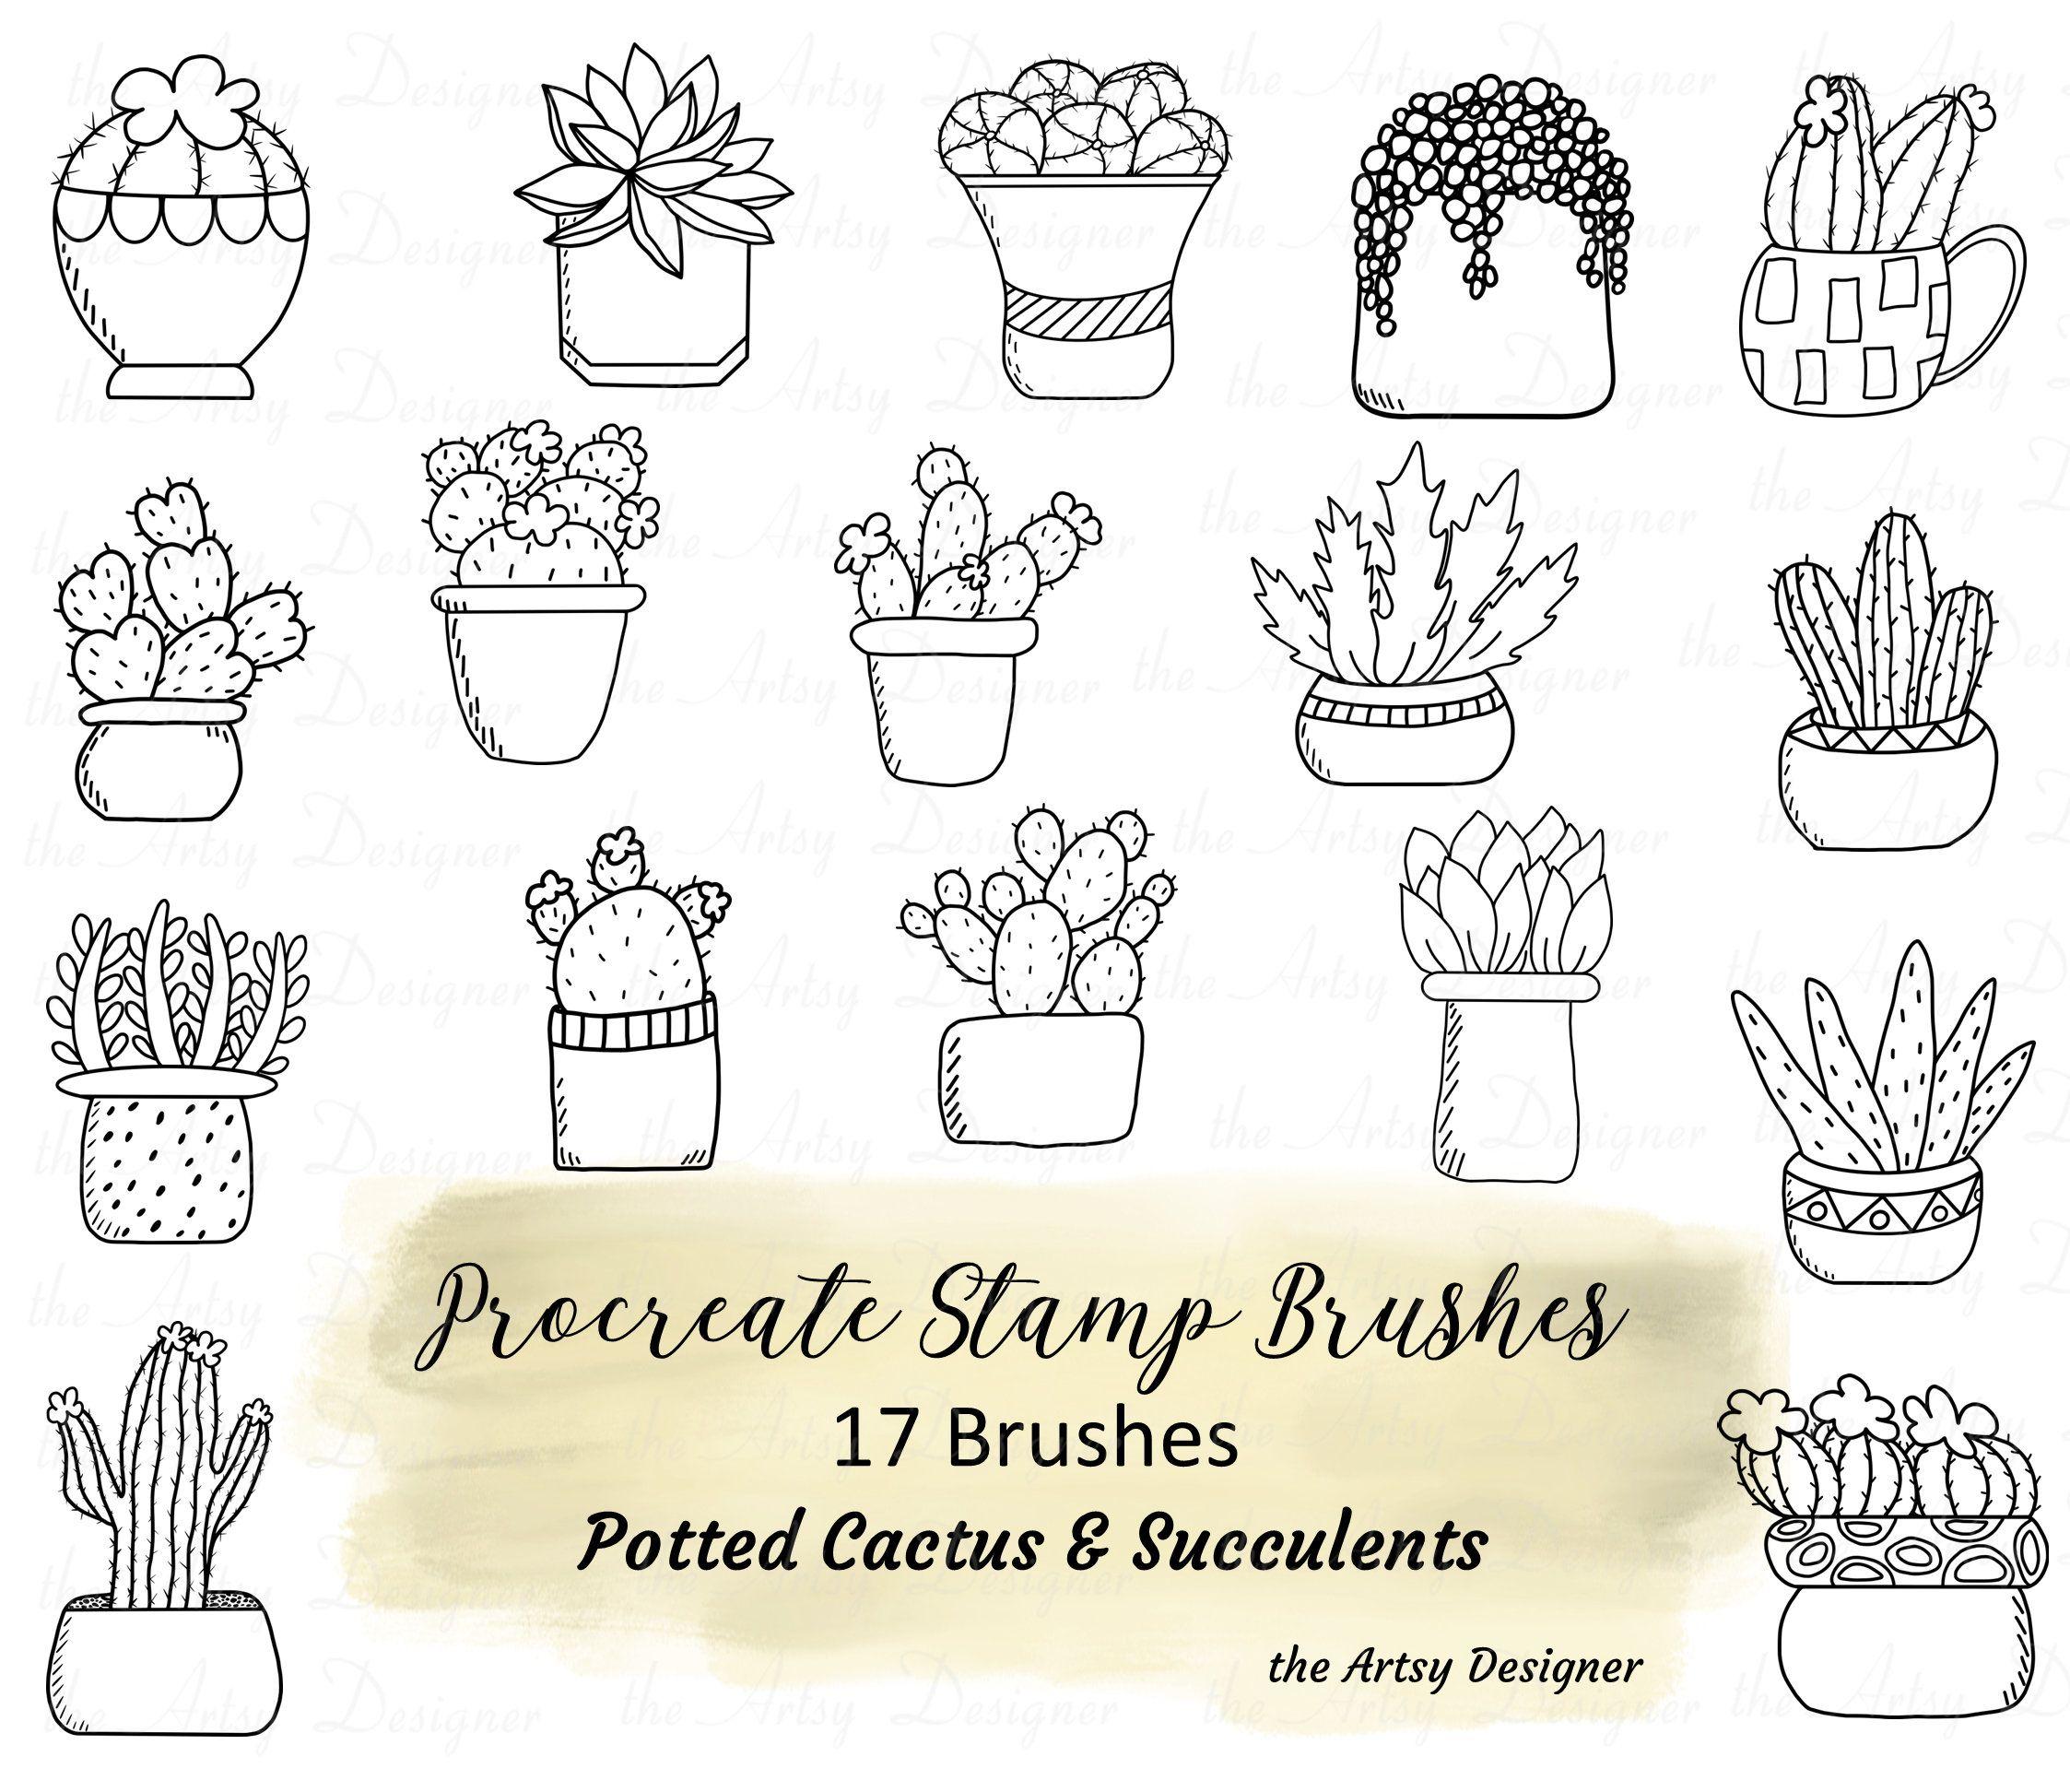 17 Procreate Brushes Bundle Cactus Succulents Lineart Brush Stamps Procreate Stamps Brushes Cacti Potted Plants Brushes Southwest Designs Procreate Brushes Procreate App Procreate